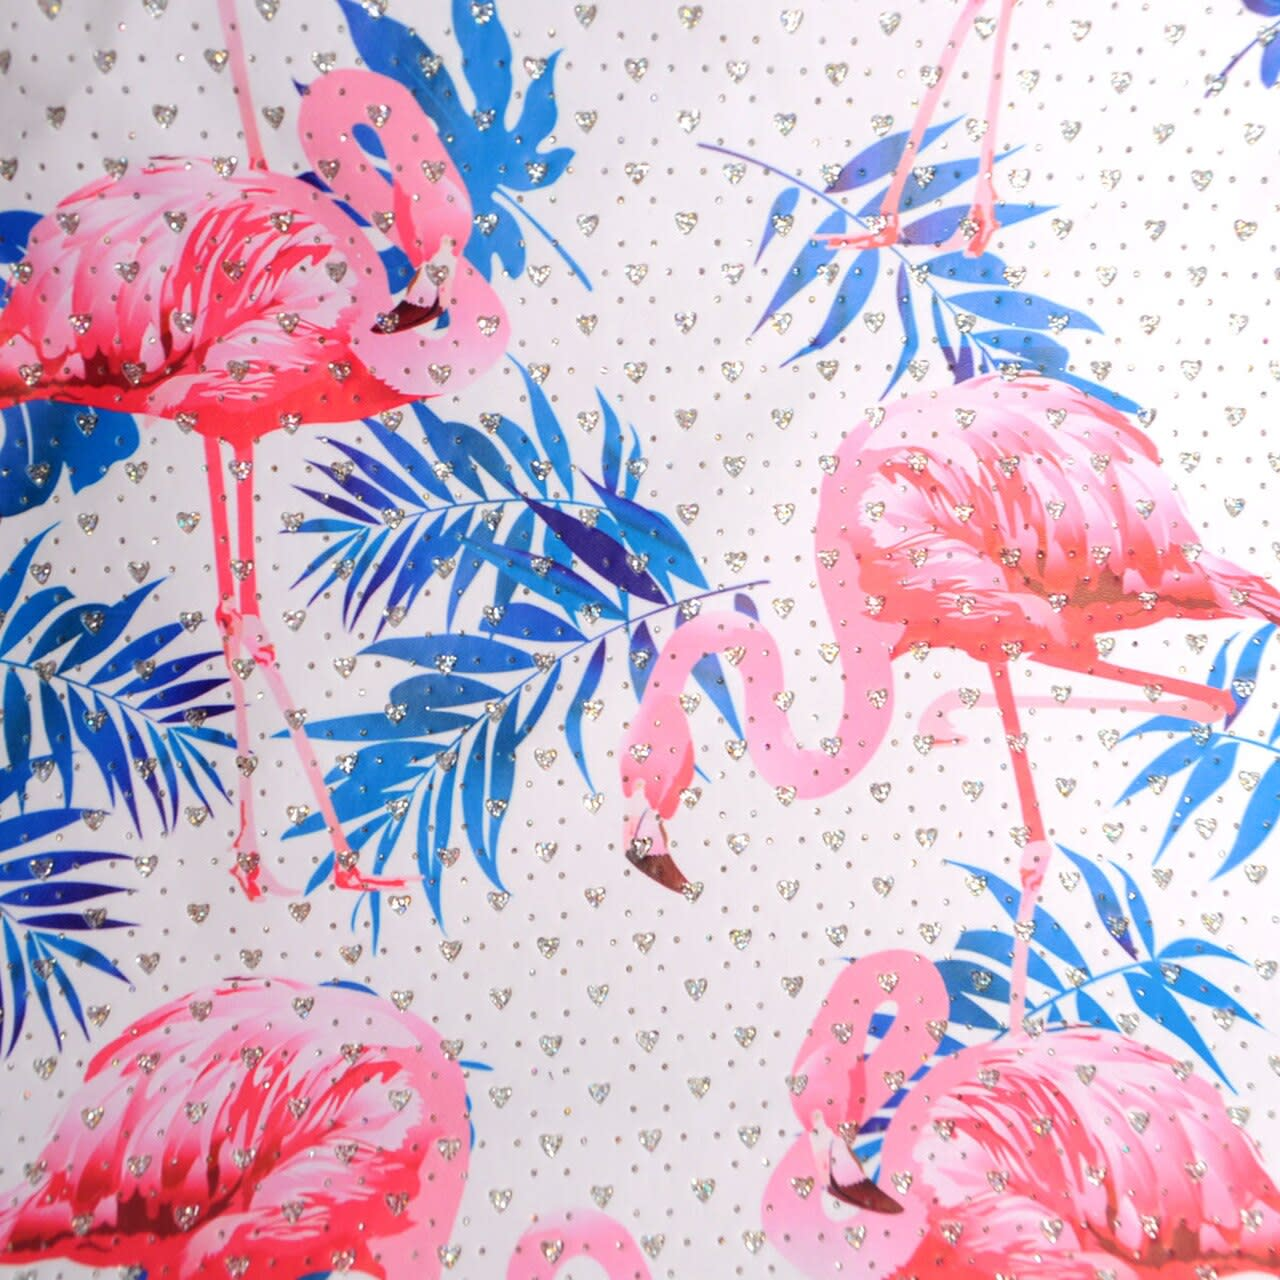 Flamingo x Palm Leaves Tote Beach Bag - Light Beige - Detail